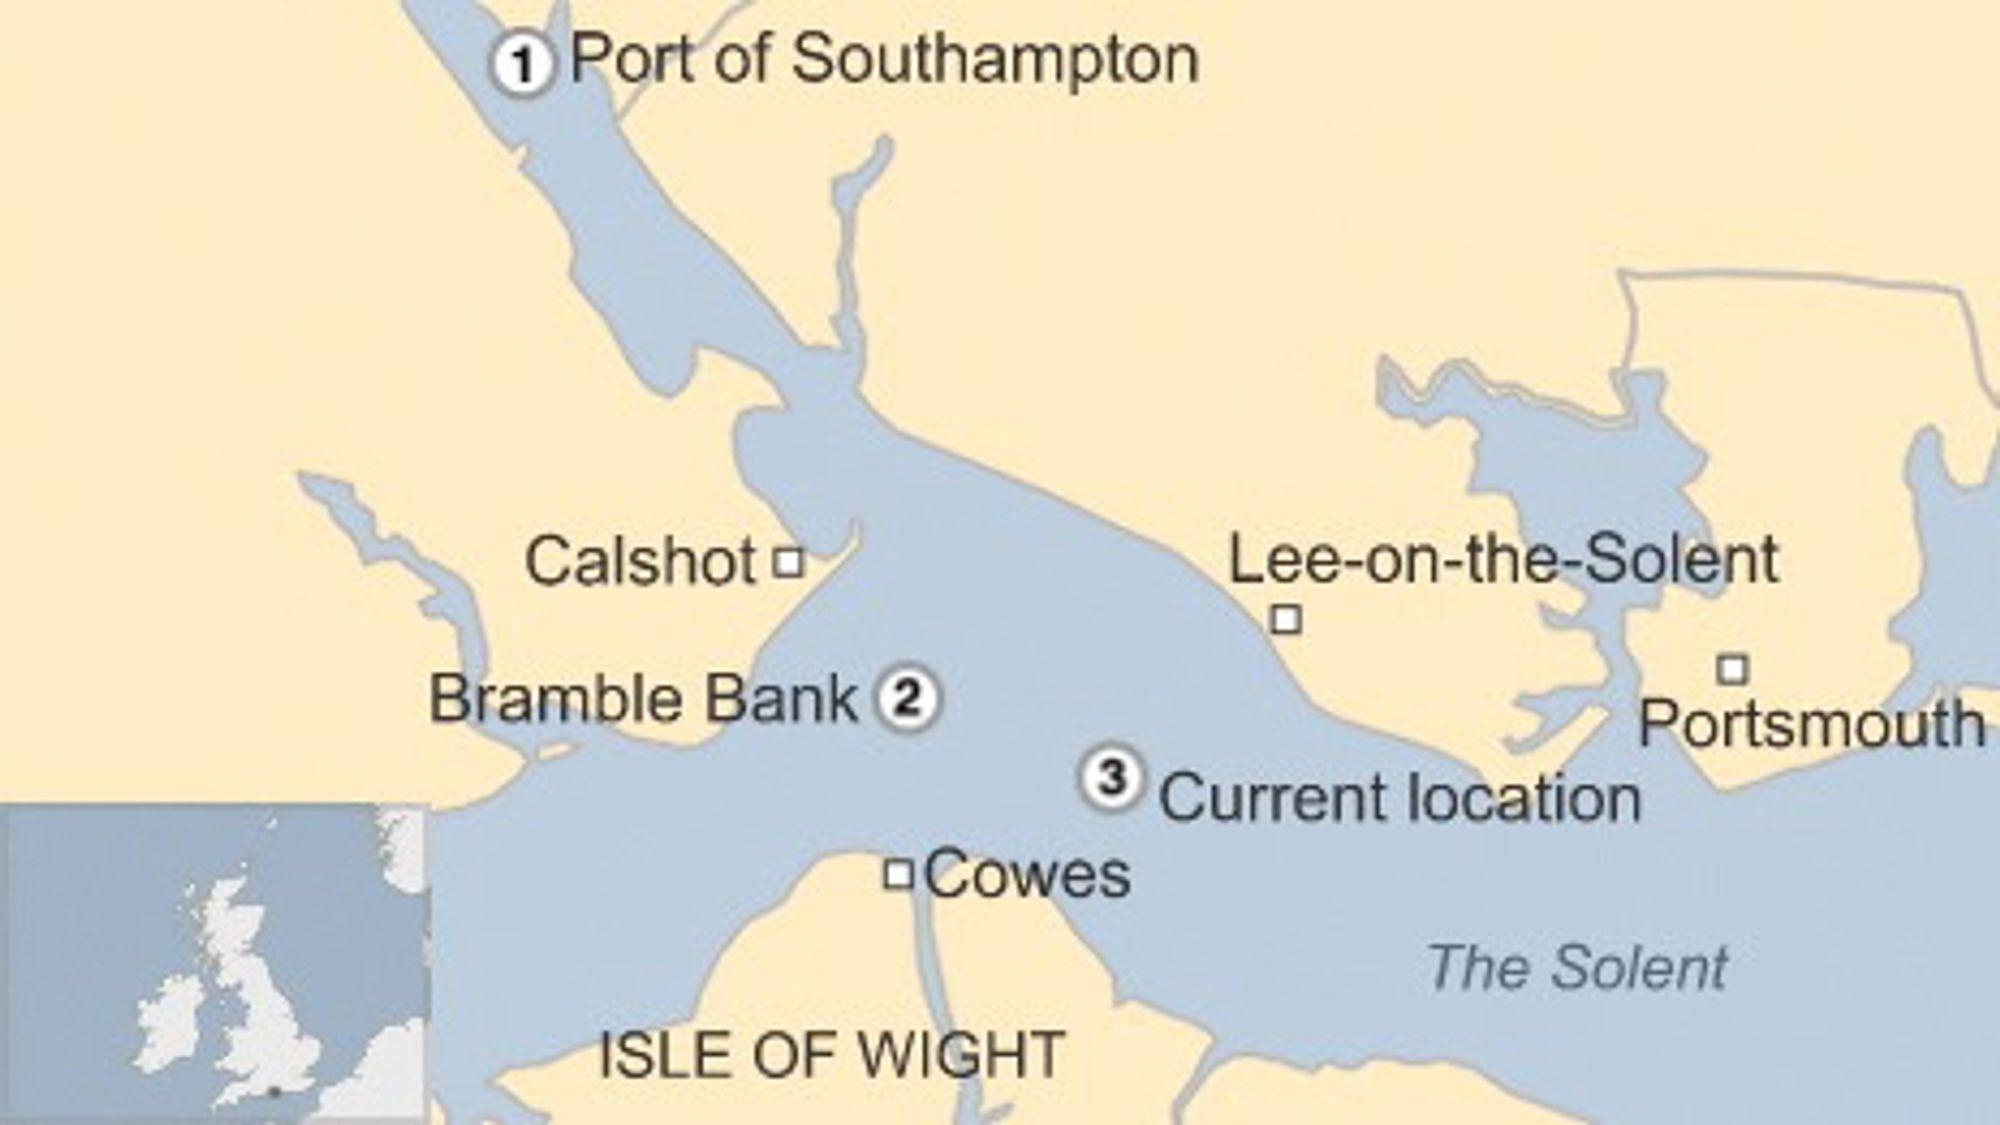 Kart som viserhvor Höegh Osaka startet sin tur 3. januar (1) og Bramble Bank der kapteinen bevisst grunnstøtte skipet (2) og Alpha Anchorage (3) der skipet ble tauet for ikke å forstyrre skipstrafikken til Southampton.